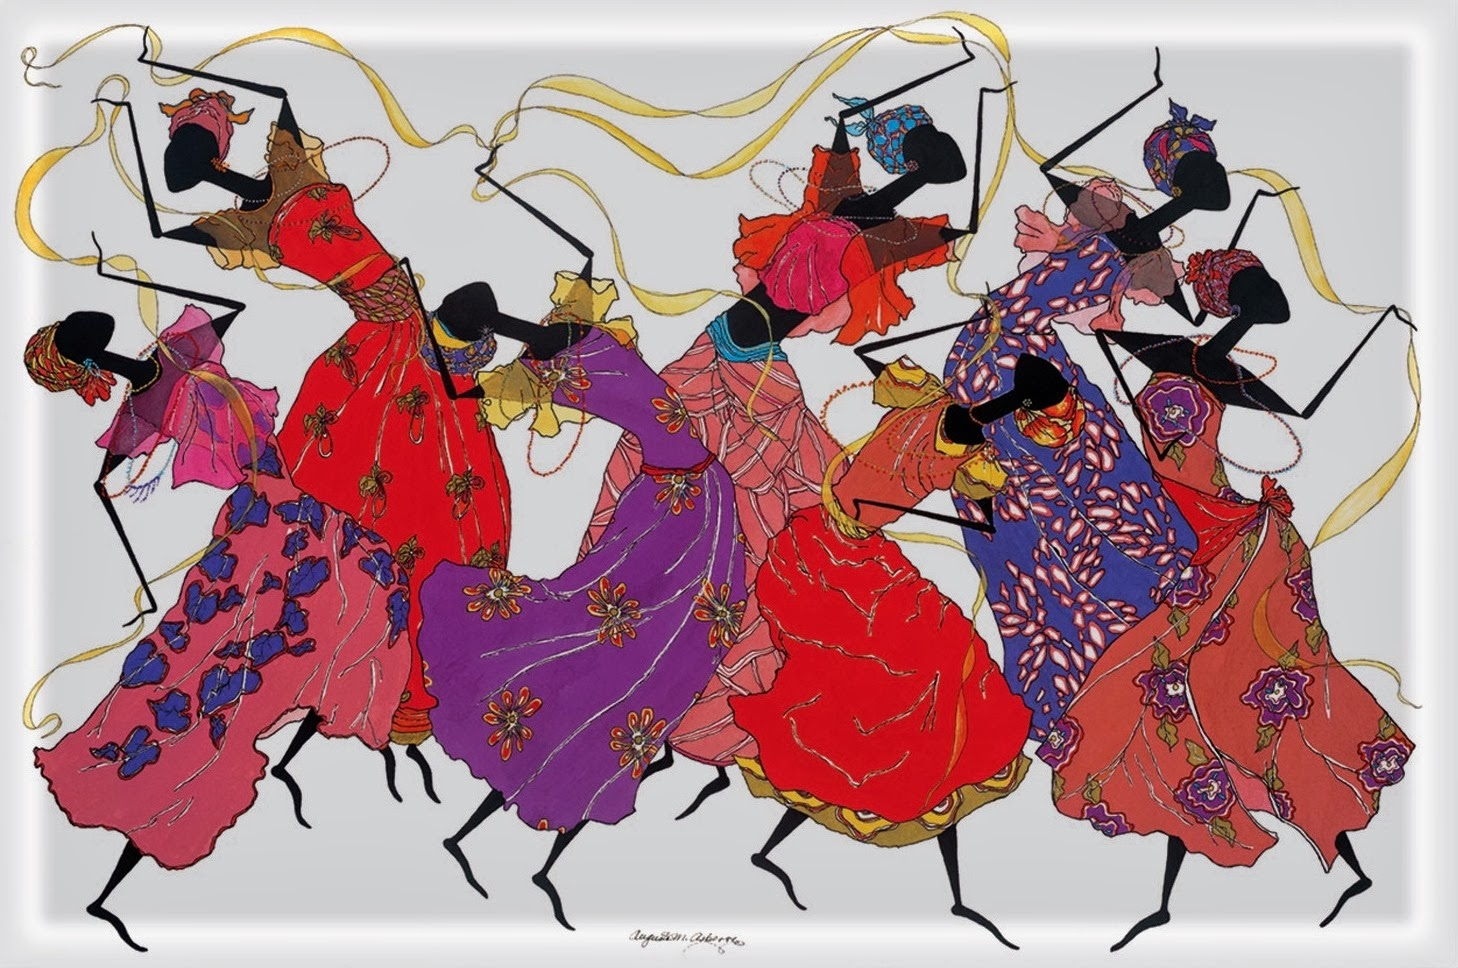 serie de pinturas al leo de negras africanas arte decorativo